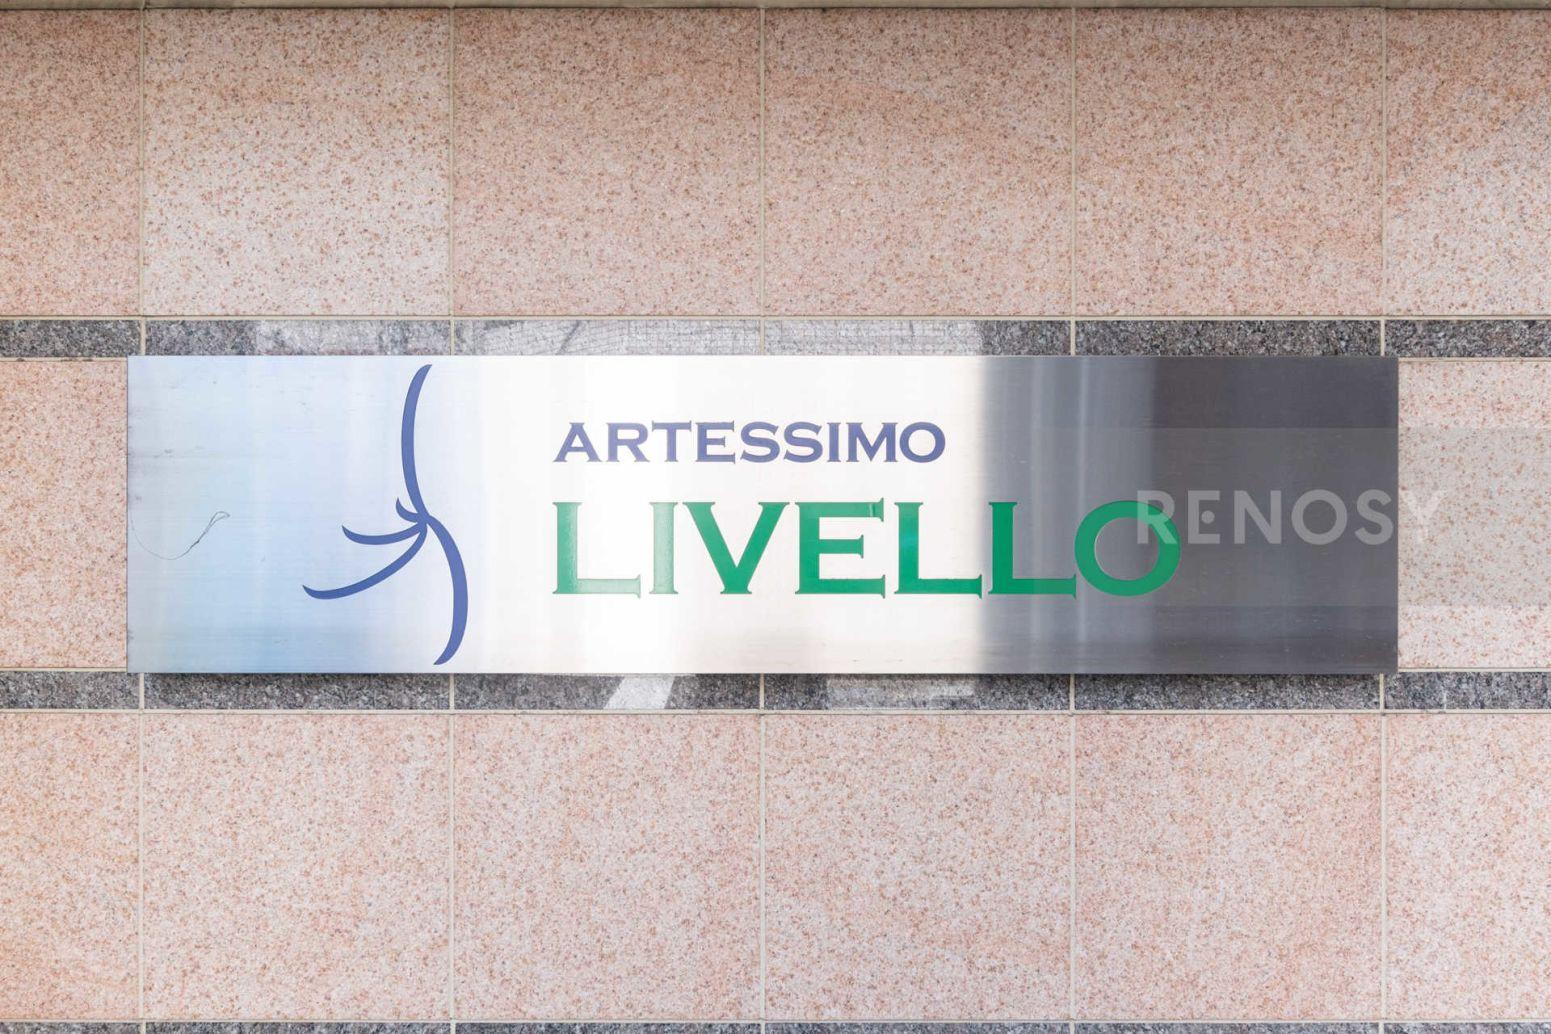 ARTESSIMO LIVELLO